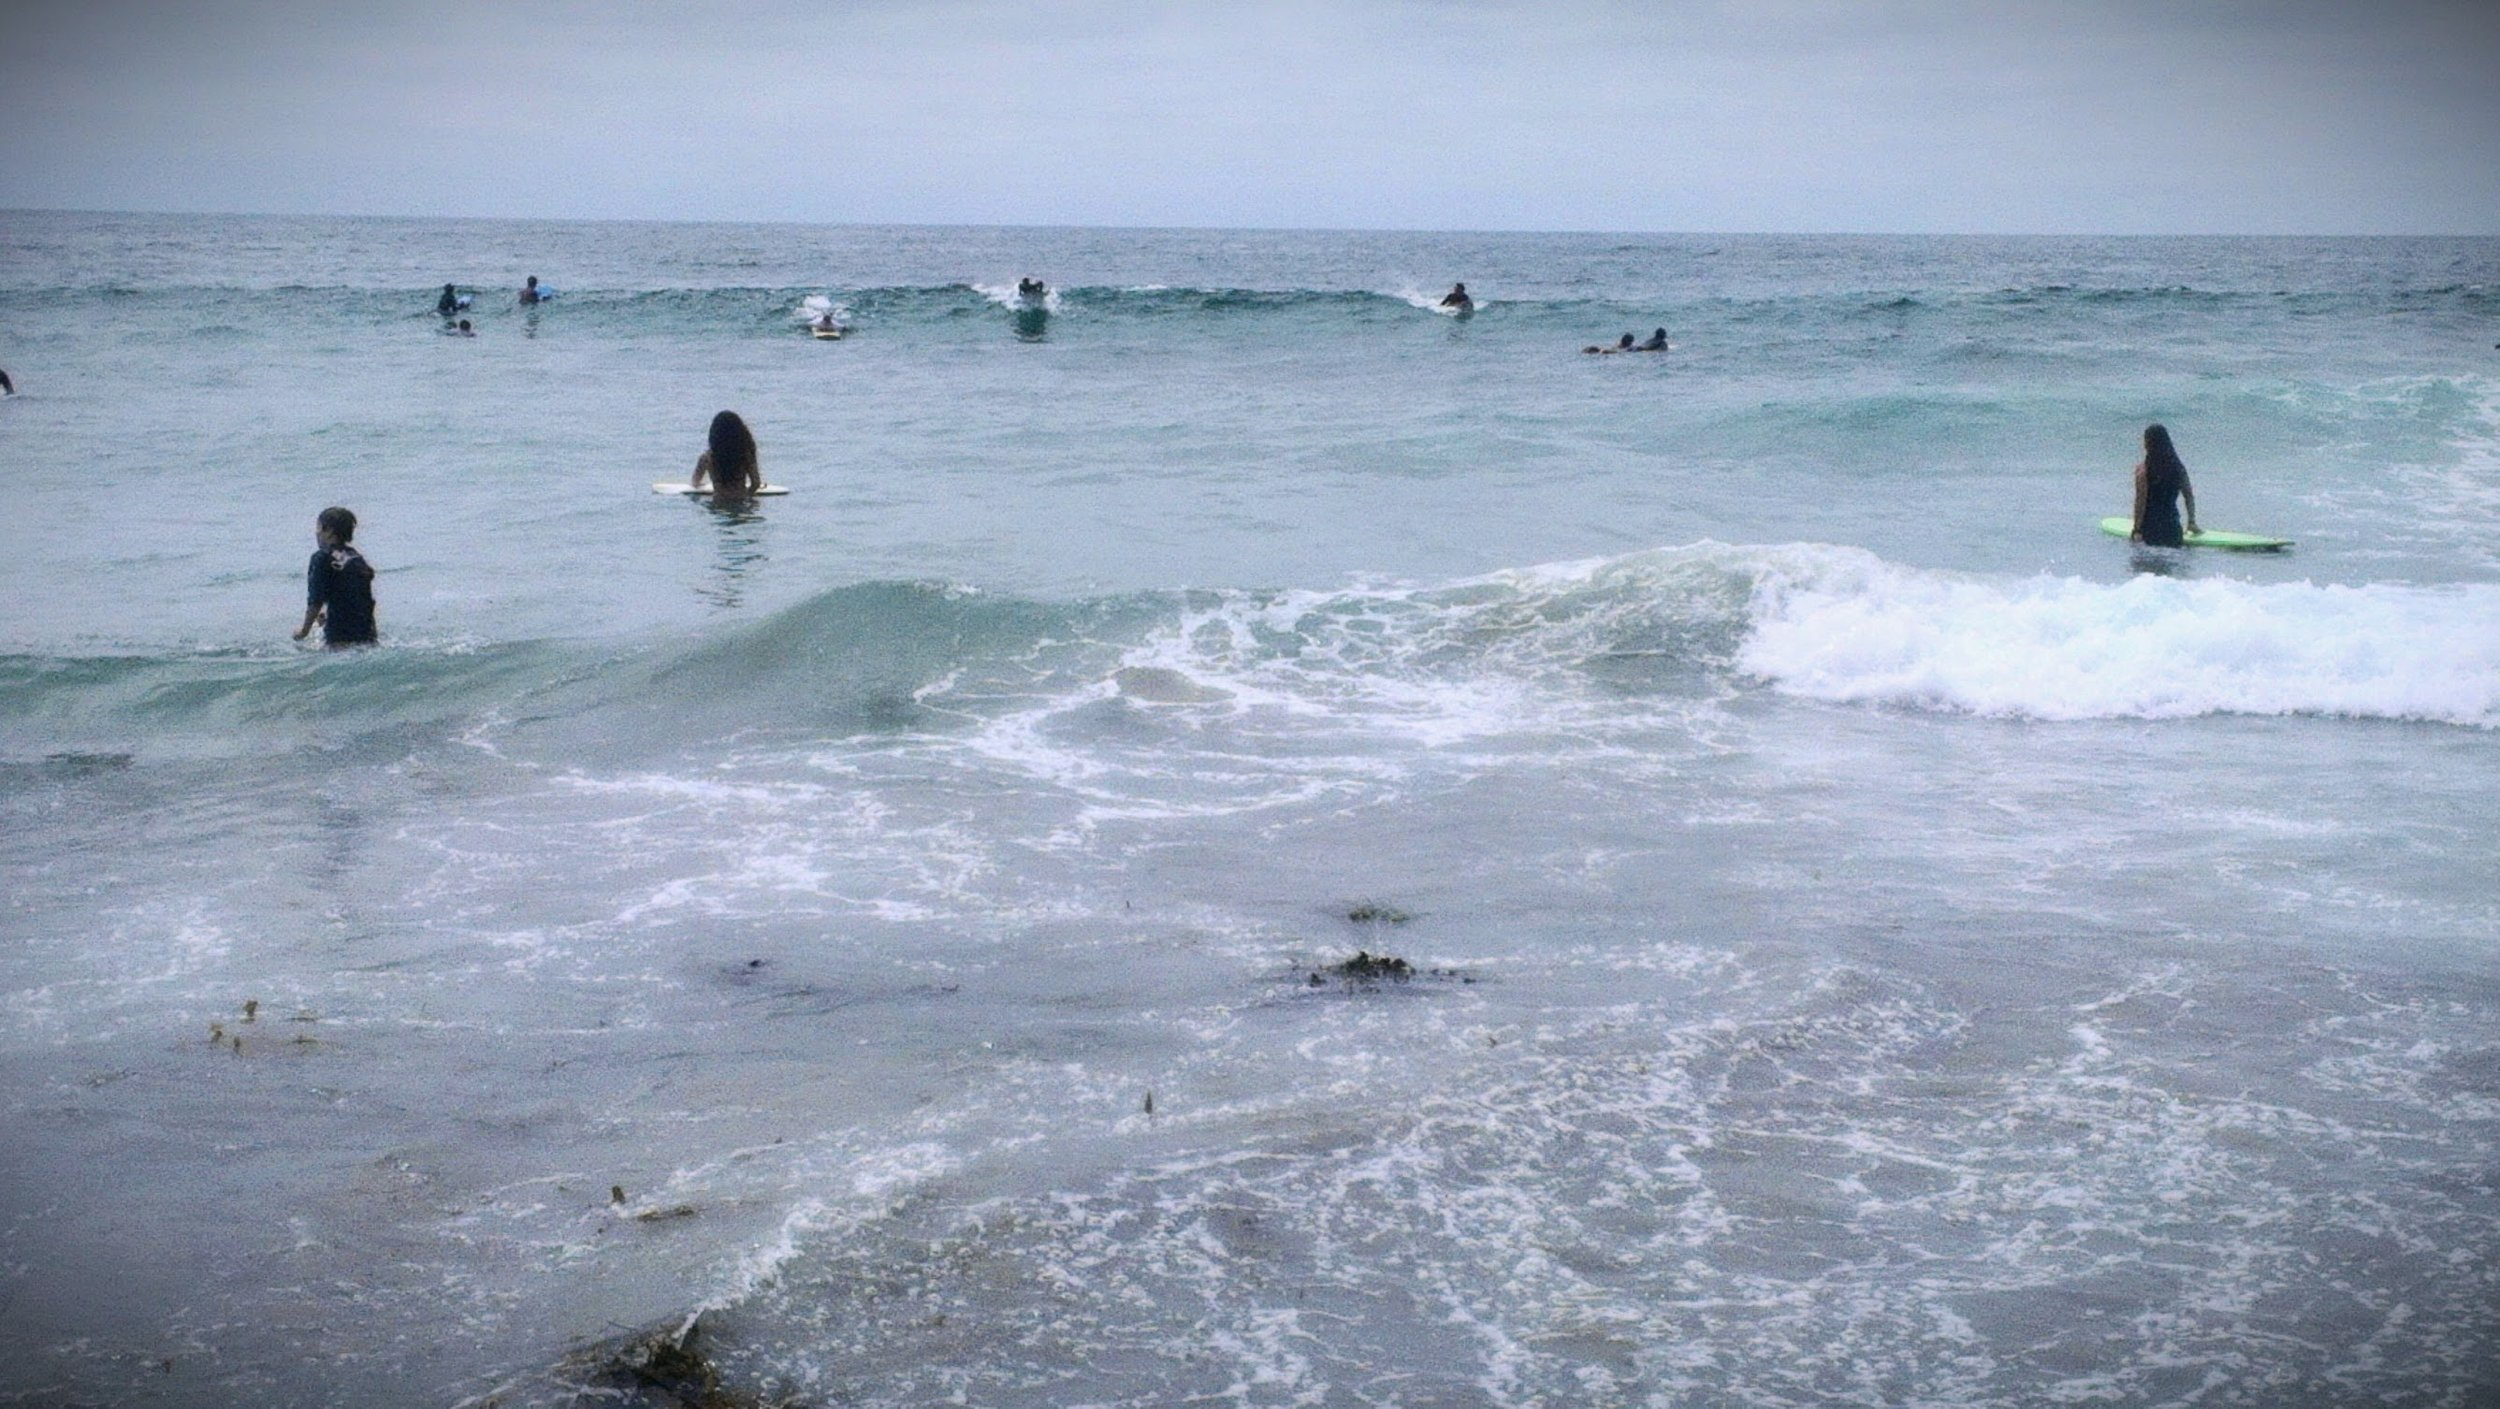 Surf urges just like you'd surf waves.